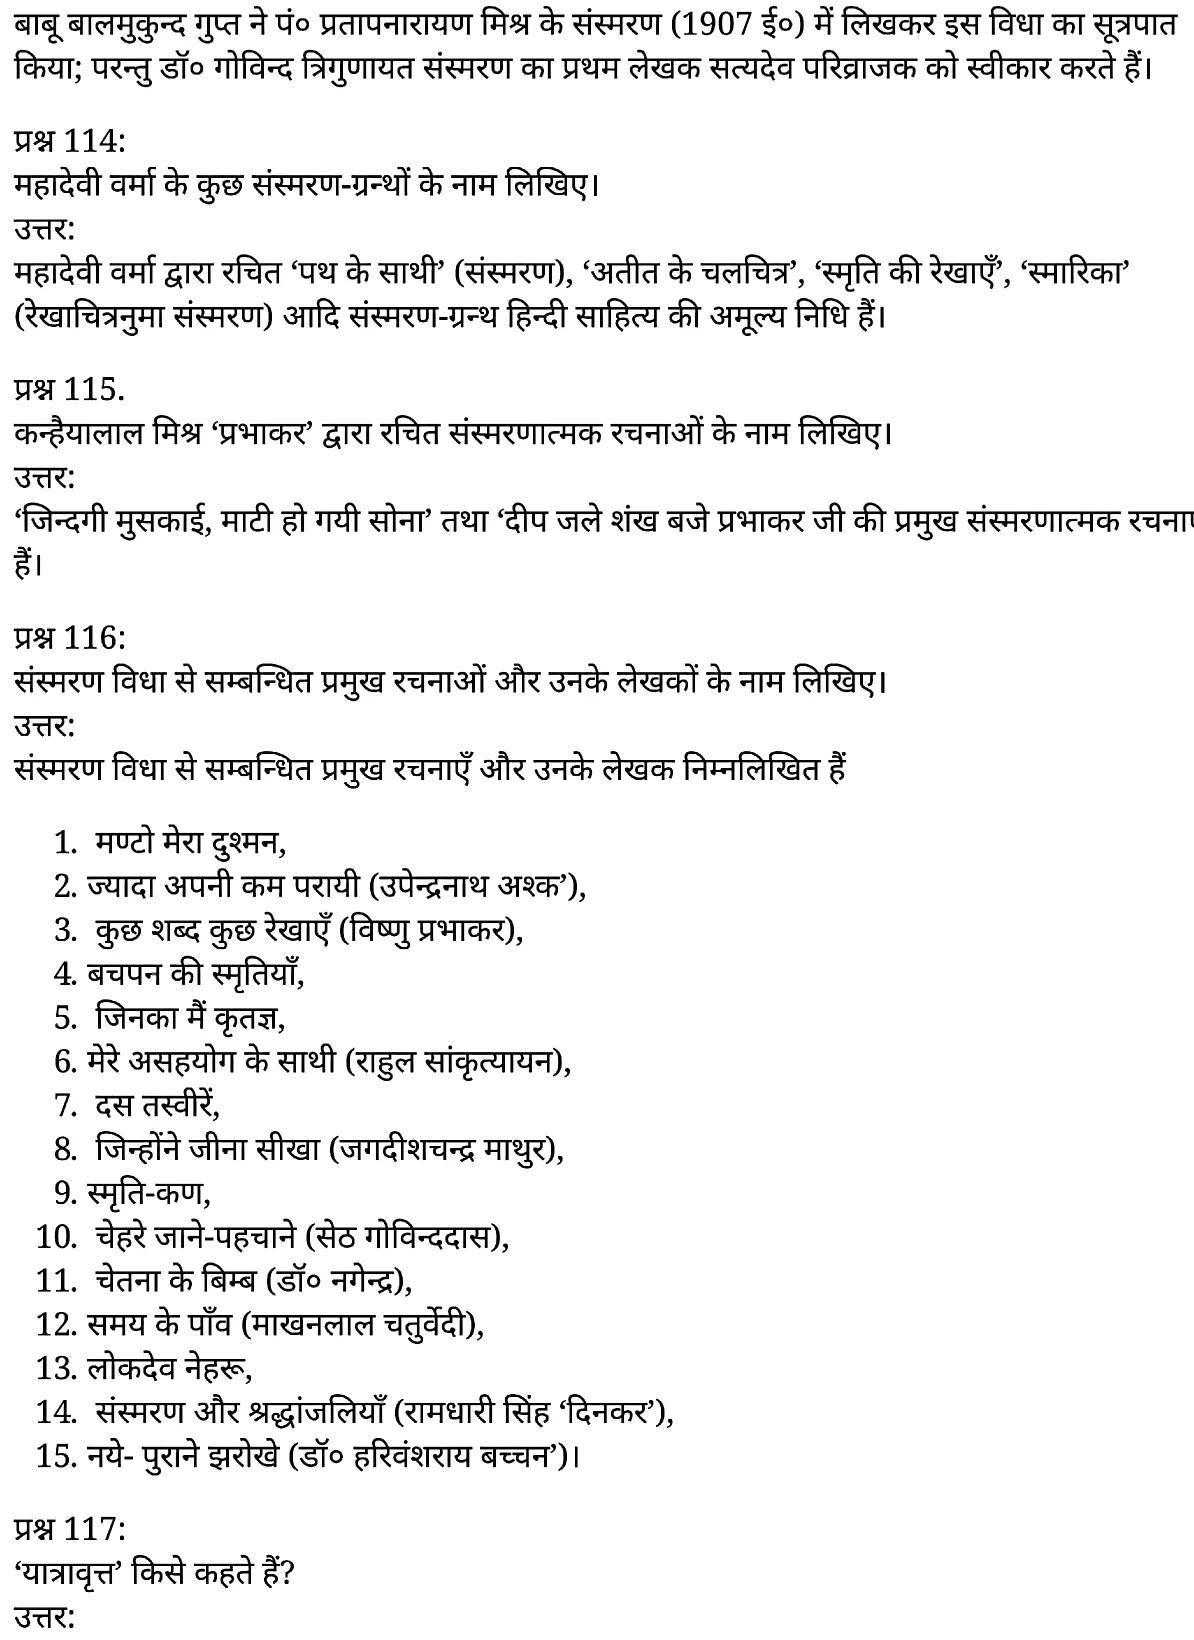 कक्षा 11 साहित्यिक हिंदीगद्य-साहित्य अतिलघु उत्तरीय प्रश्न के नोट्स साहित्यिक हिंदी में एनसीईआरटी समाधान,   class 11 sahityik hindi khand kaavyagady-saahity atilaghu uttareey prashn,  class 11 sahityik hindi gady-saahity atilaghu uttareey prashnncert solutions in sahityik hindi,  class 11 sahityik hindi gady-saahity atilaghu uttareey prashnnotes in sahityik hindi,  class 11 sahityik hindi gady-saahity atilaghu uttareey prashnquestion answer,  class 11 sahityik hindi gady-saahity atilaghu uttareey prashnnotes,  11   class gady-saahity atilaghu uttareey prashngady-saahity atilaghu uttareey prashnin sahityik hindi,  class 11 sahityik hindi gady-saahity atilaghu uttareey prashnin sahityik hindi,  class 11 sahityik hindi gady-saahity atilaghu uttareey prashnimportant questions in sahityik hindi,  class 11 sahityik hindi gady-saahity atilaghu uttareey prashn notes in sahityik hindi,  class 11 sahityik hindi gady-saahity atilaghu uttareey prashntest,  class 11 sahityik hindi  chapter 1 gady-saahity atilaghu uttareey prashnpdf,  class 11 sahityik hindi gady-saahity atilaghu uttareey prashnnotes pdf,  class 11 sahityik hindi gady-saahity atilaghu uttareey prashnexercise solutions,  class 11 sahityik hindi khand kaavyagady-saahity atilaghu uttareey prashn, class 11 sahityik hindi gady-saahity atilaghu uttareey prashnnotes study rankers,  class 11 sahityik hindi gady-saahity atilaghu uttareey prashnnotes,  class 11 sahityik hindi gady-saahity atilaghu uttareey prashn notes,   gady-saahity atilaghu uttareey prashn class 11  notes pdf,  gady-saahity atilaghu uttareey prashnclass 11  notes  ncert,   gady-saahity atilaghu uttareey prashnclass 11 pdf,    gady-saahity atilaghu uttareey prashn book,     gady-saahity atilaghu uttareey prashnquiz class 11  ,       11  th gady-saahity atilaghu uttareey prashn   book up board,       up board 11  th gady-saahity atilaghu uttareey prashnnotes,  कक्षा 11 साहित्यिक हिंदीगद्य-साहित्य अतिलघु उत्तरीय प्रश्न, कक्षा 11 साहित्यिक हिंदी का खण्डकाव्